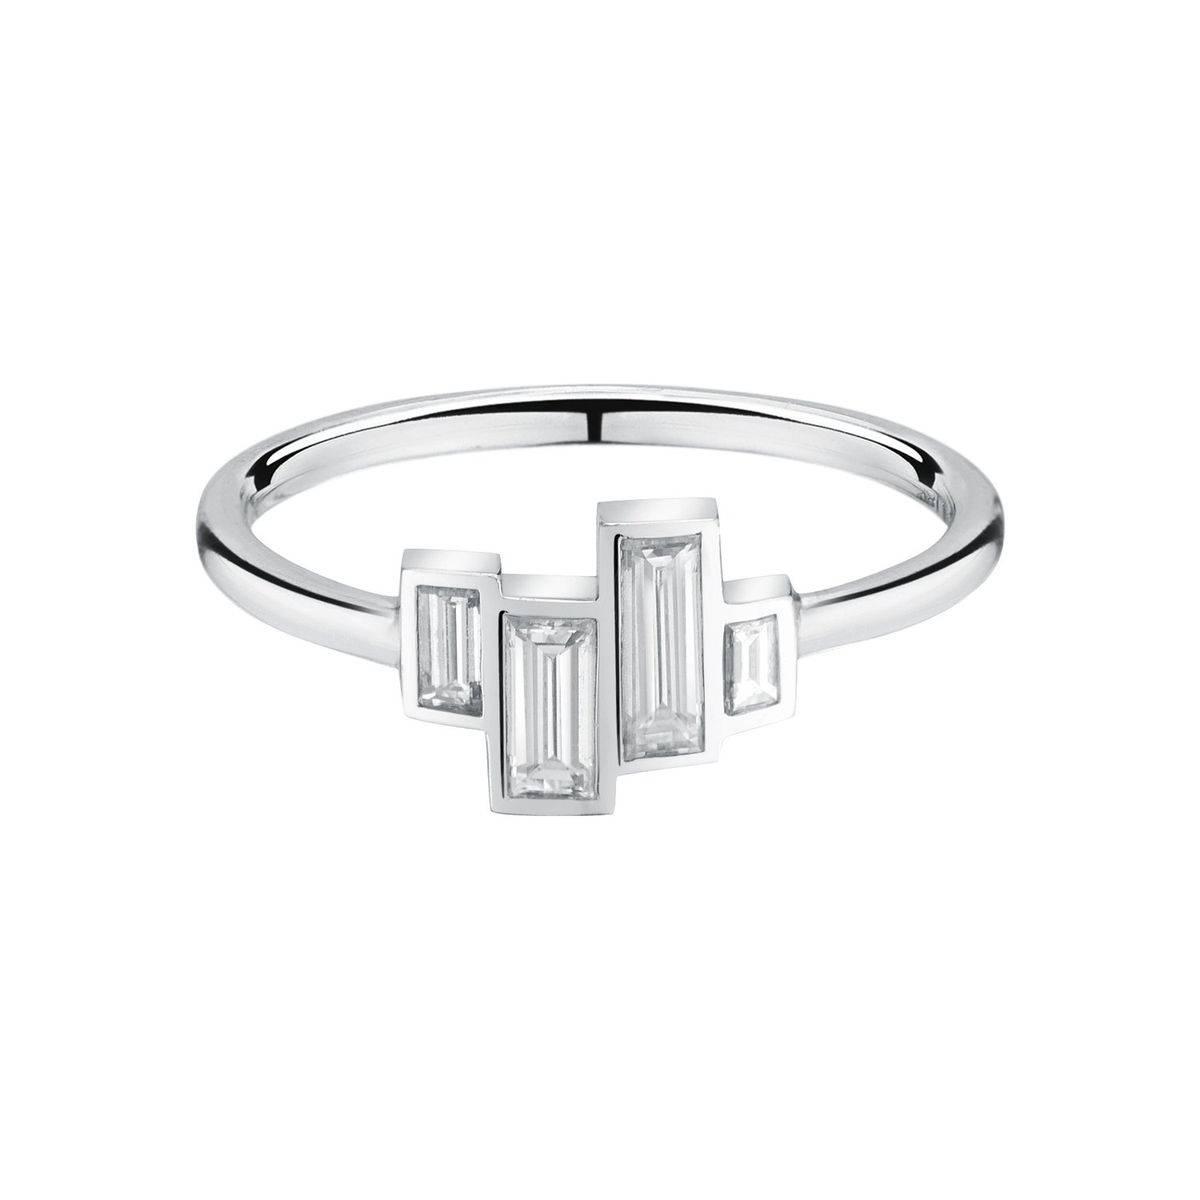 Art deco engagement ring-569142471654412094